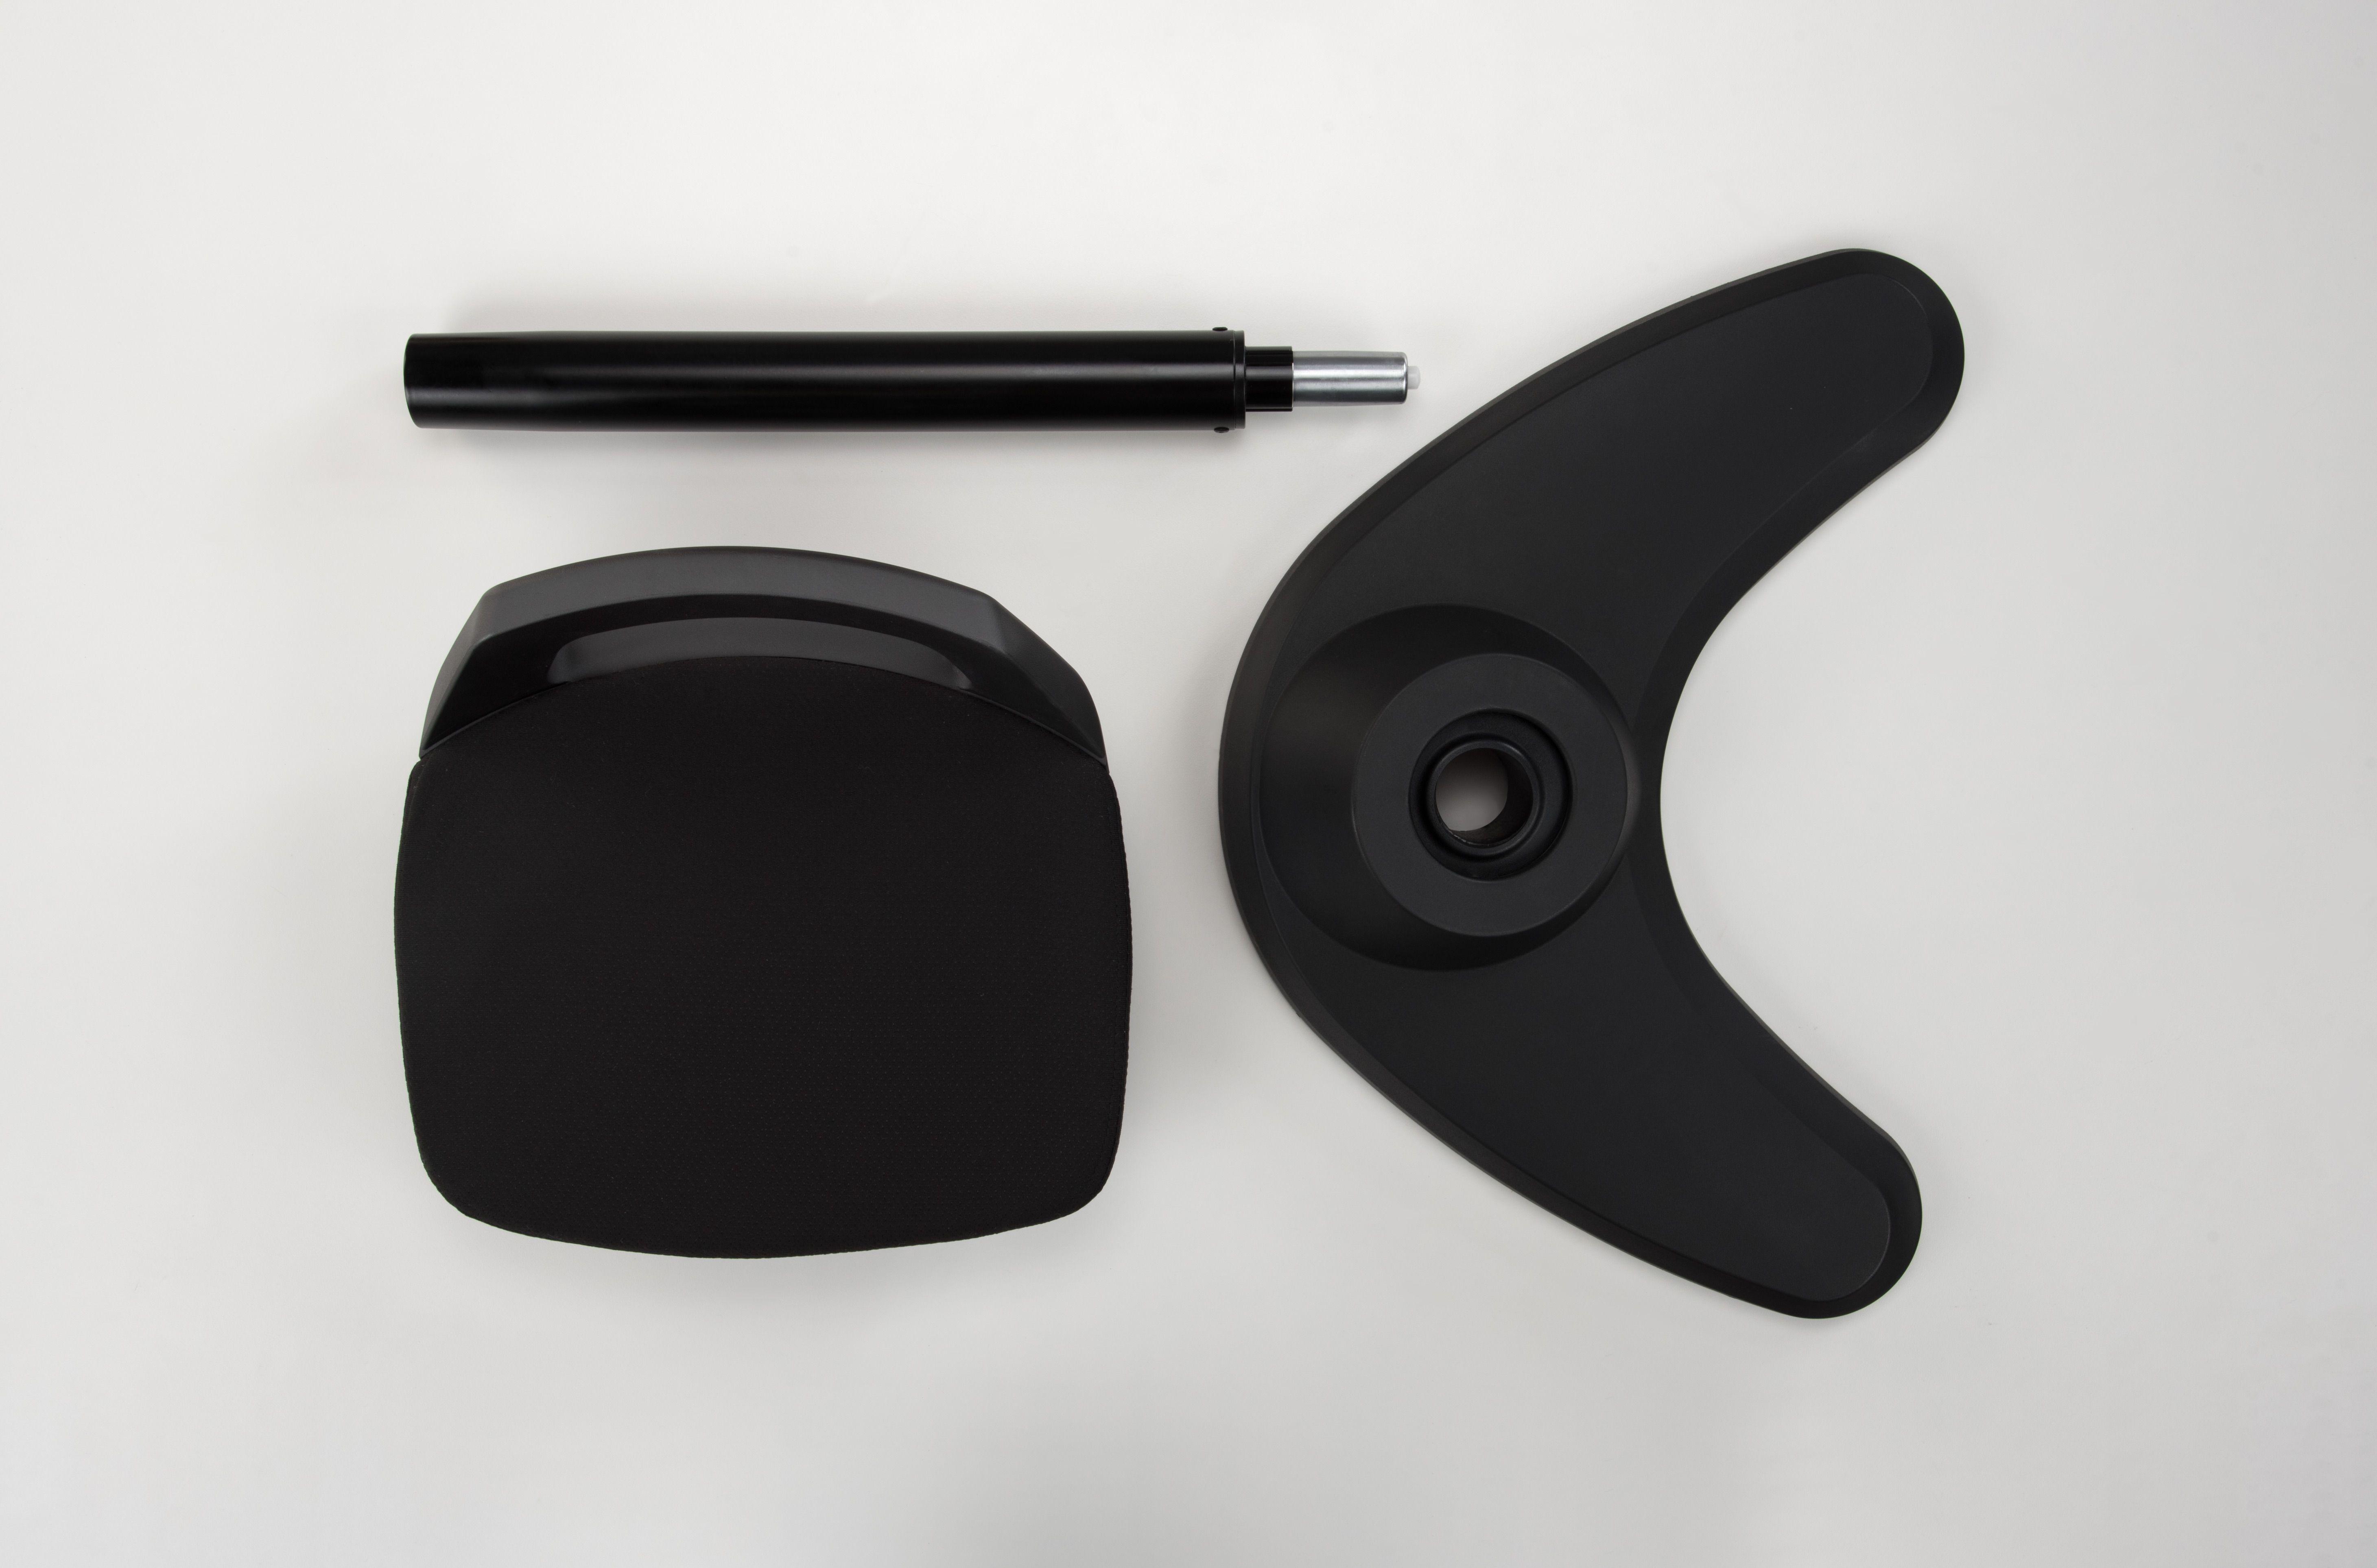 Motion Stool by UPLIFT Desk Black